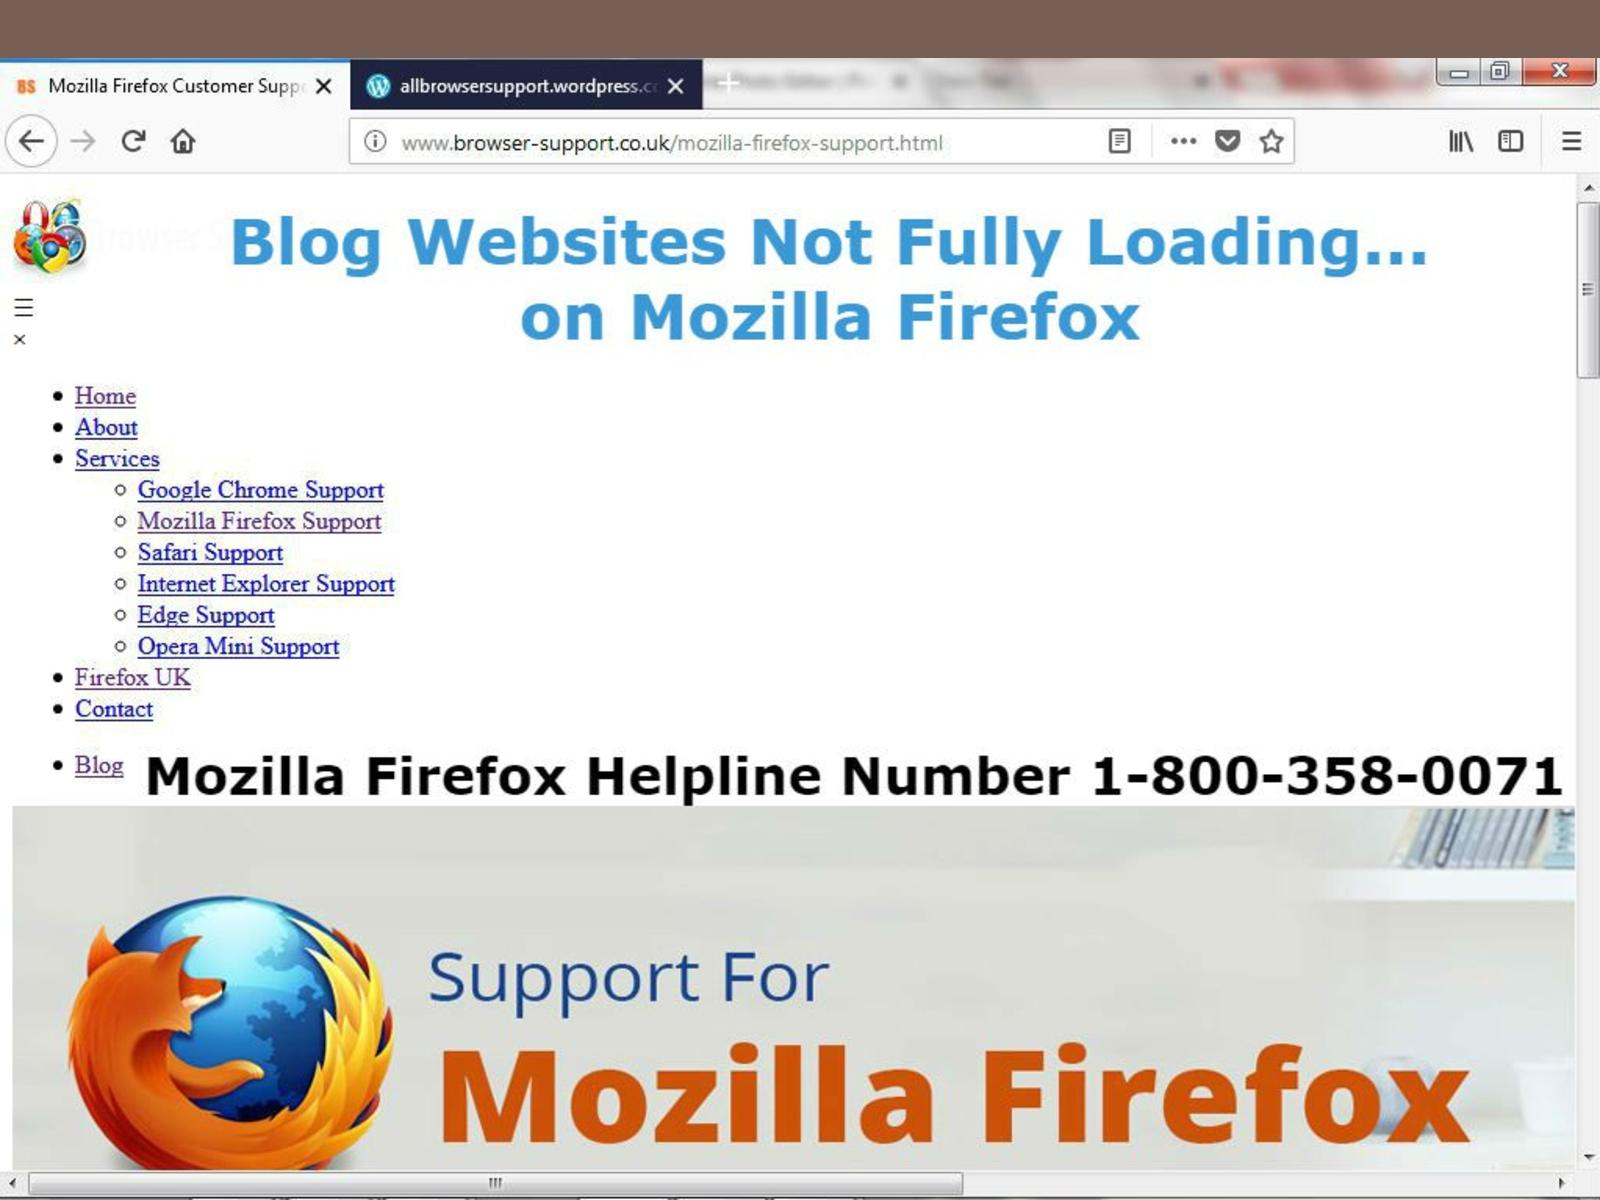 Calaméo - Websites not loading on Mozilla Firefox Helpline 1-800-358